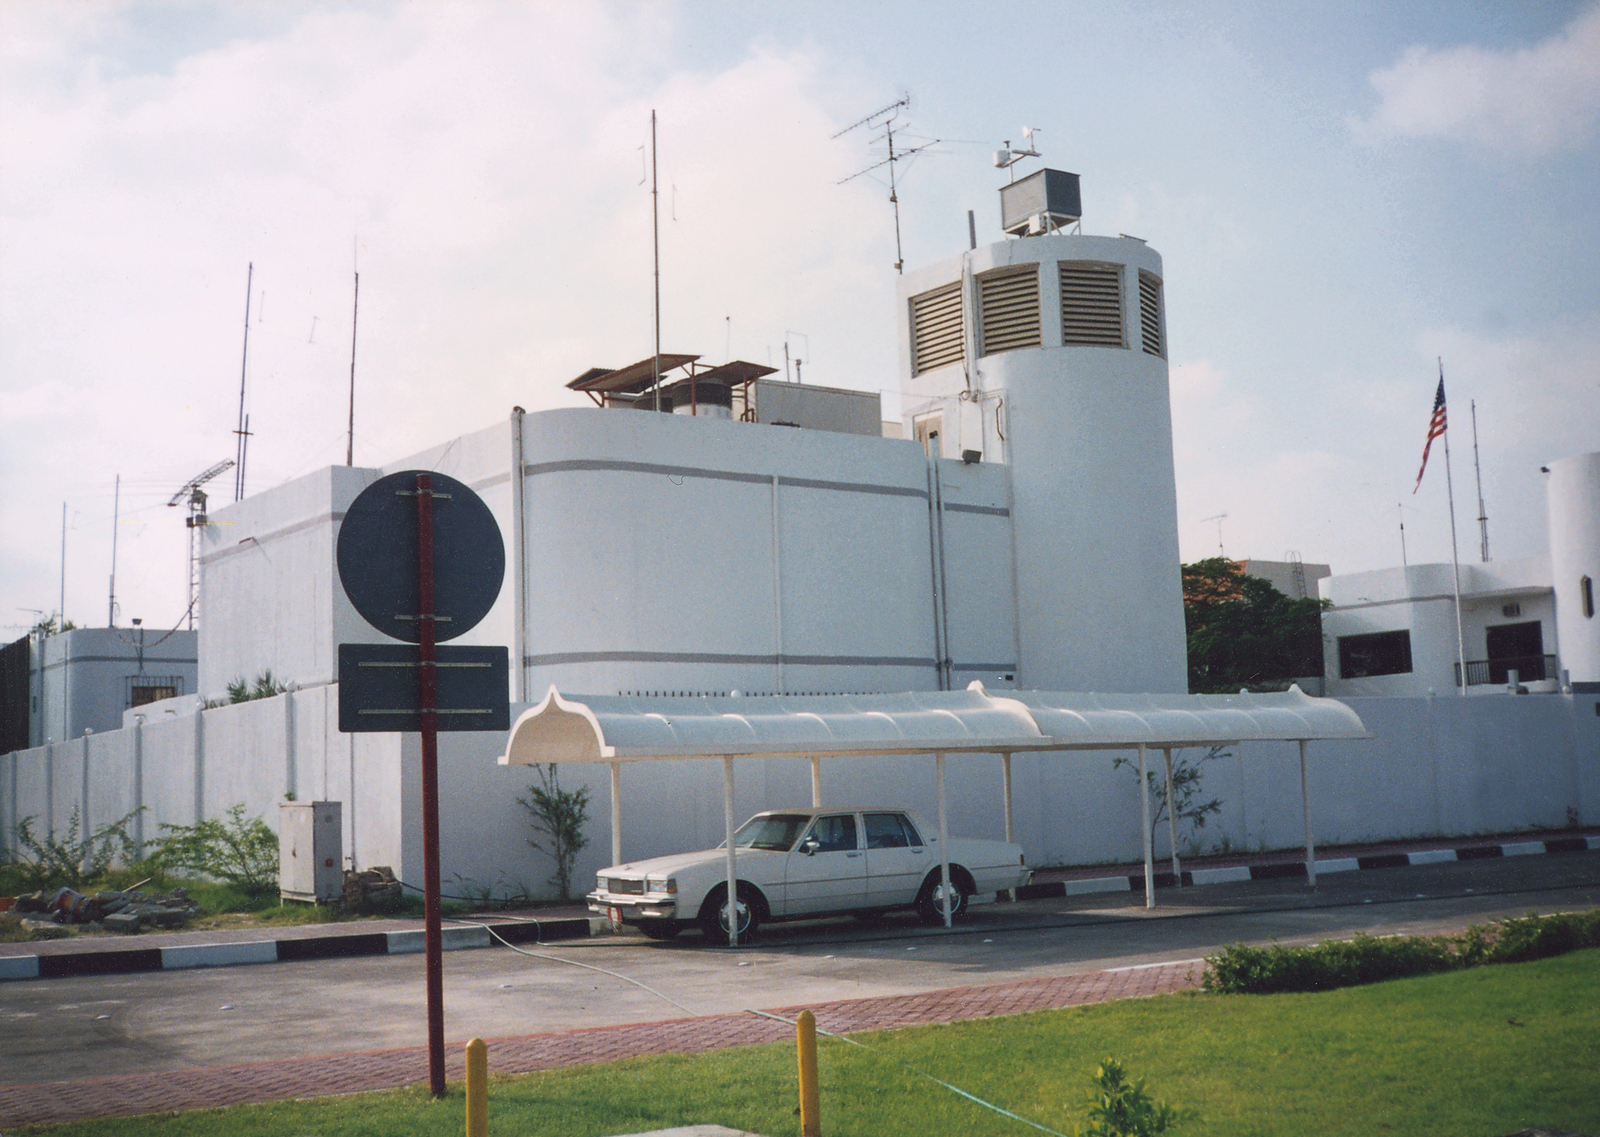 Abu Dhabi - Chancery Office Building - 1993